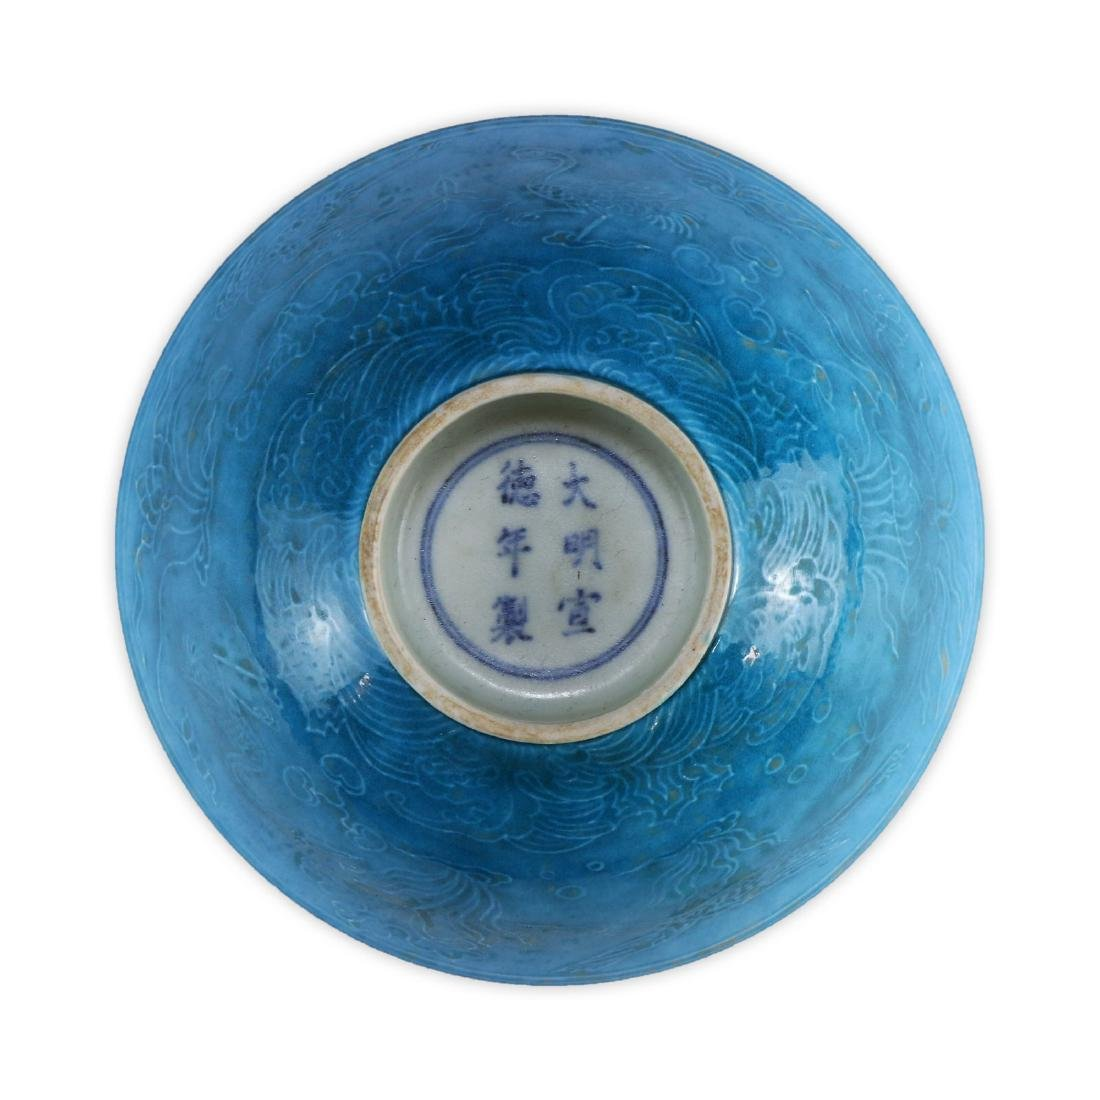 A CHINESE ANTIQUE BLUE GLAZED STEM BOWL - 4